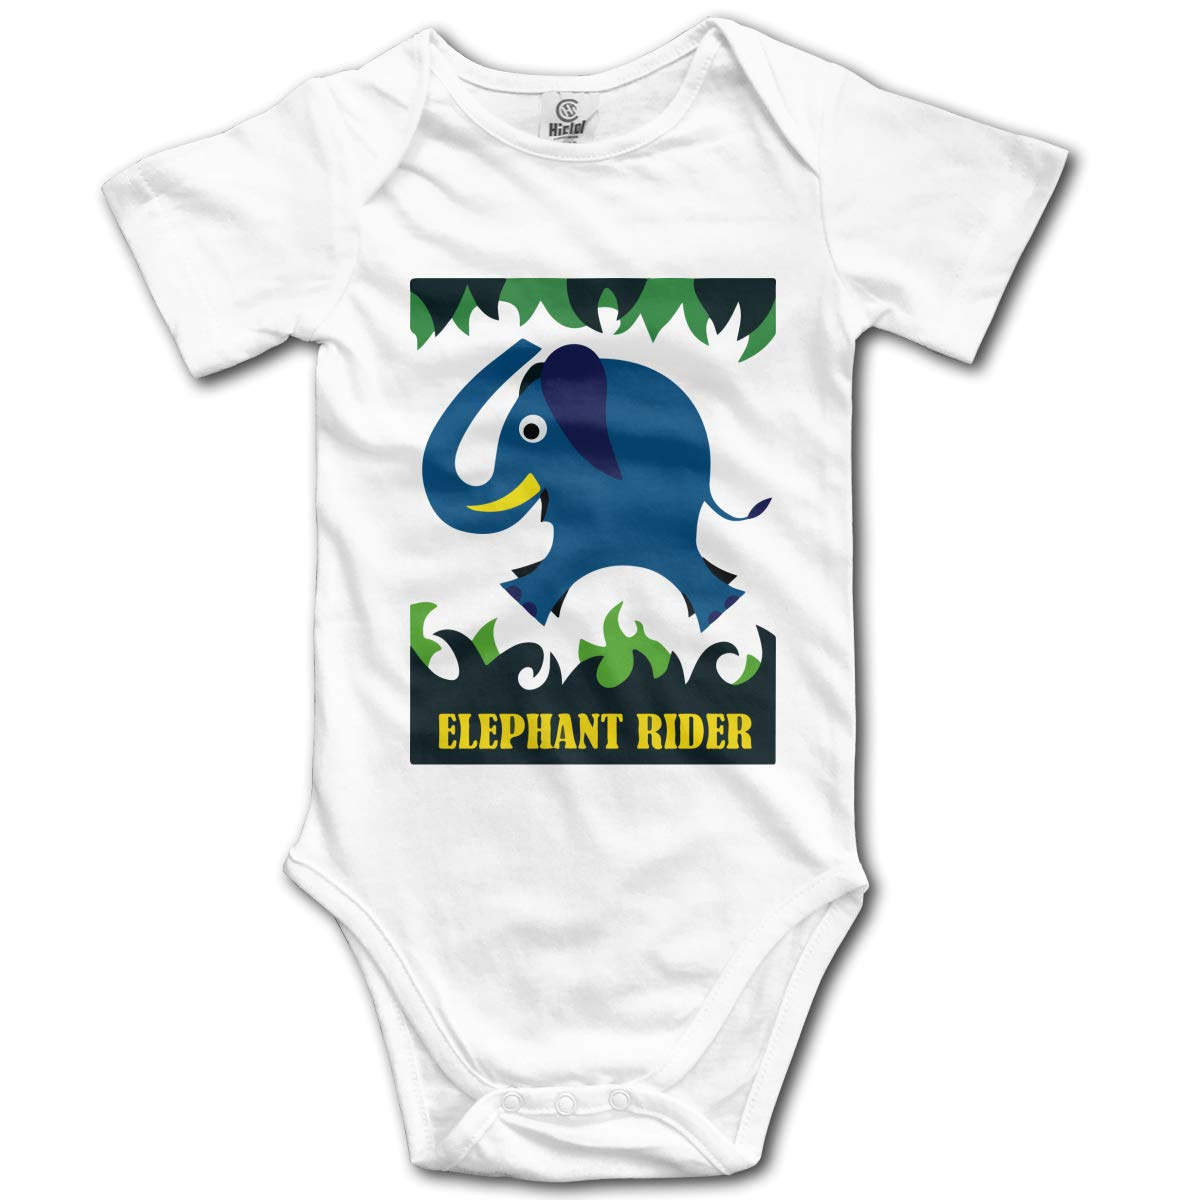 Elephant Rider Newborn Infant Baby 100/% Organic Cotton Romper Bodysuit Tops 0-24M